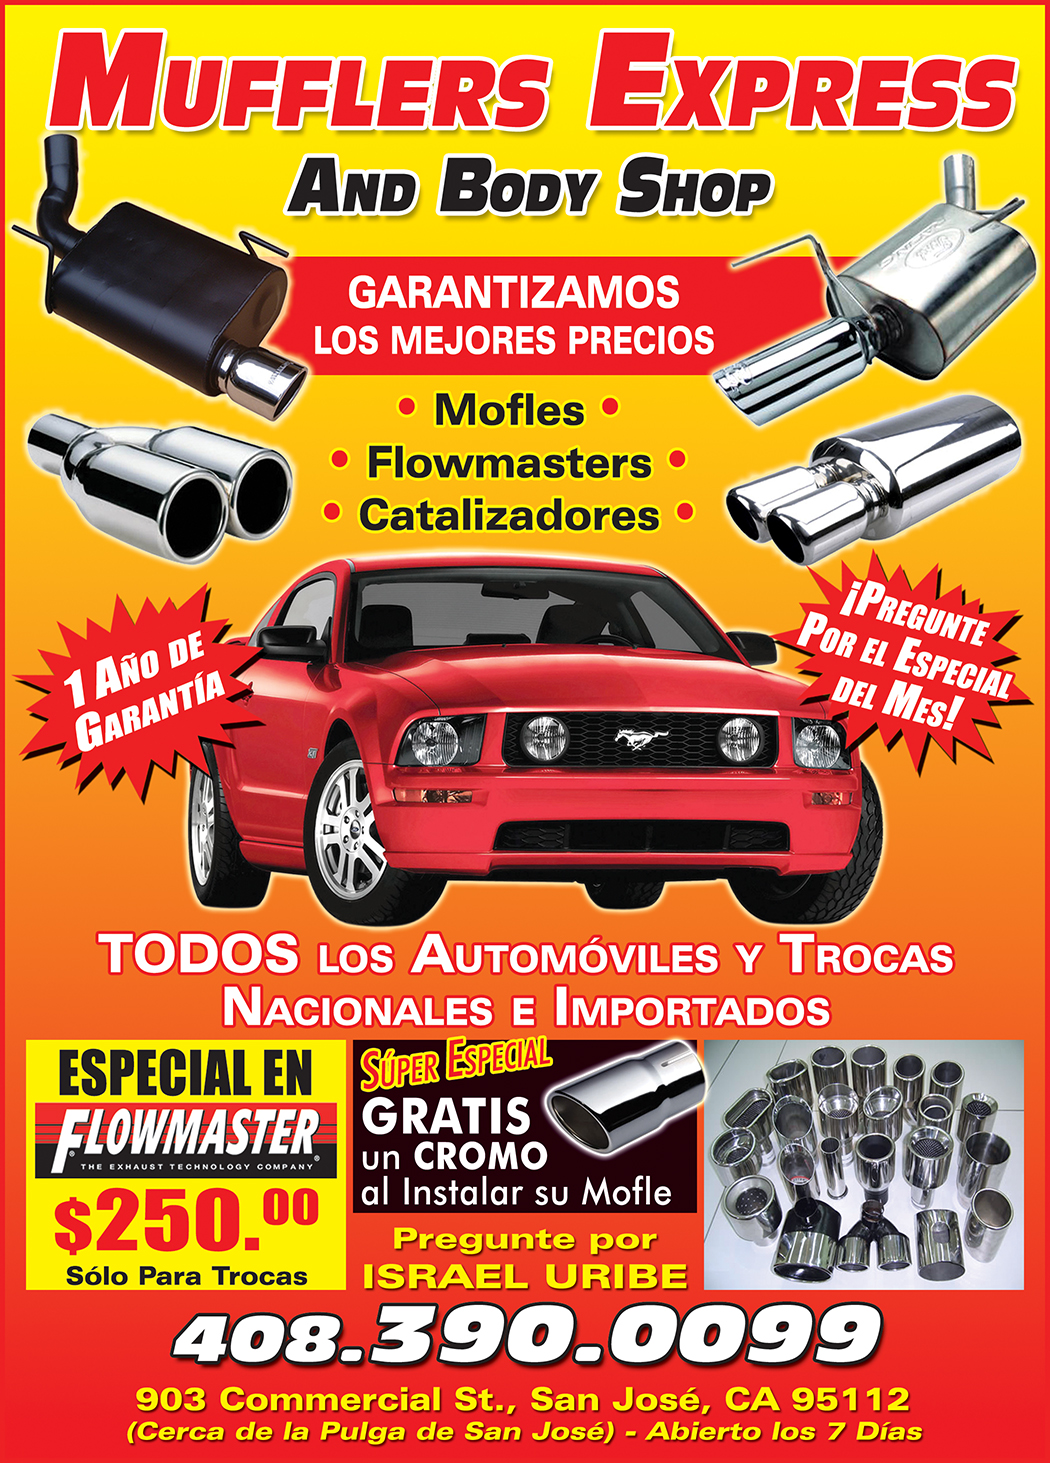 Mufflers Express 1pag agosto 2012 copy.jpg